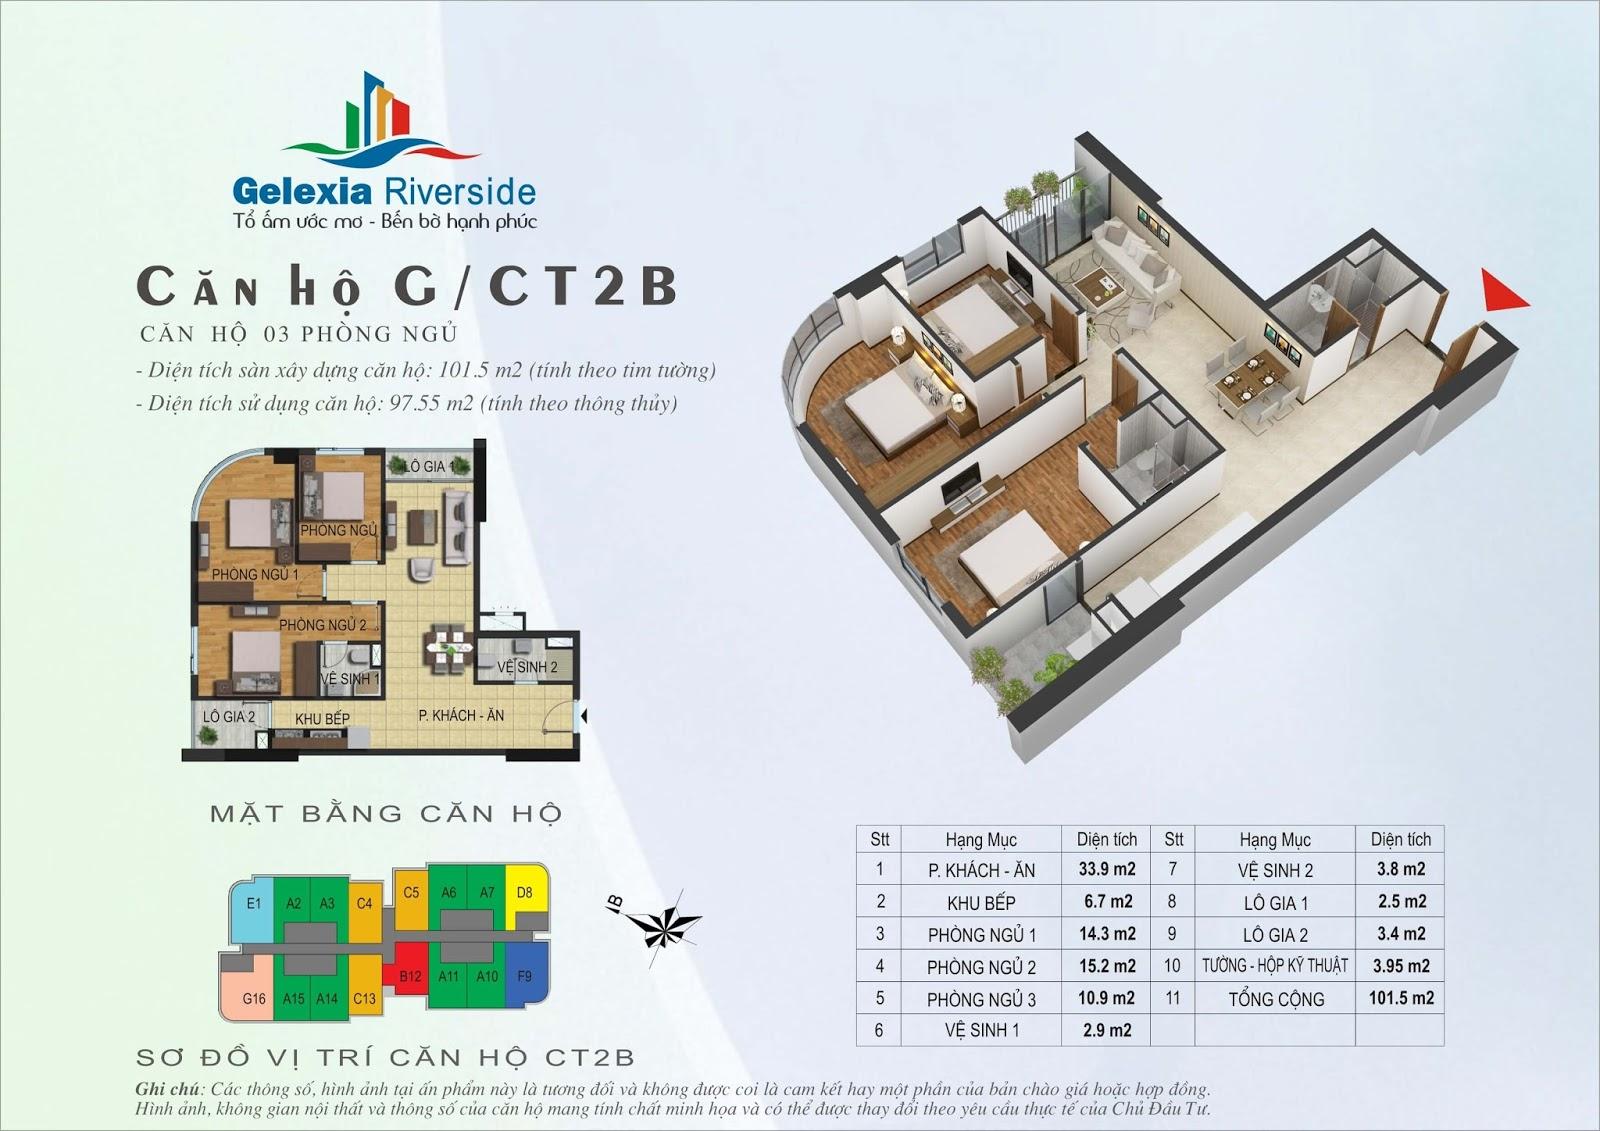 Mặt bằng căn hộ 101,5 m2 tòa CT2B - Gelexia Riverside